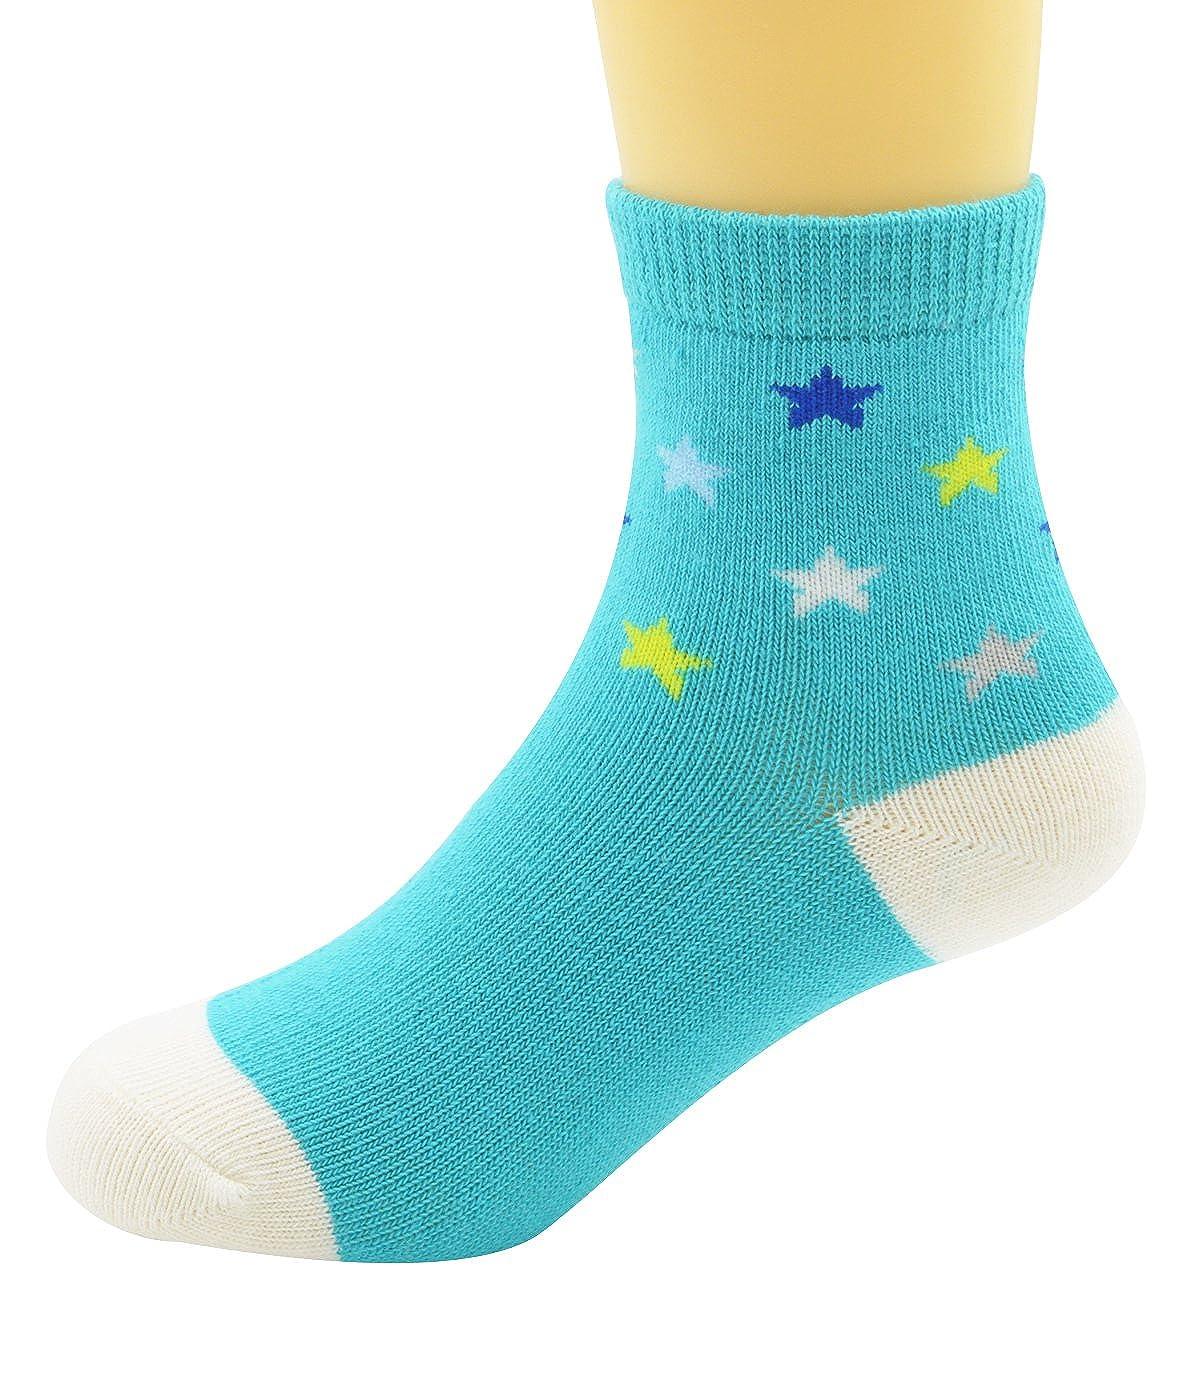 Century Star Fashion Lovely Kid Baby Children Boys Girls Cotton Basic Comfort 5 Pairs Socks